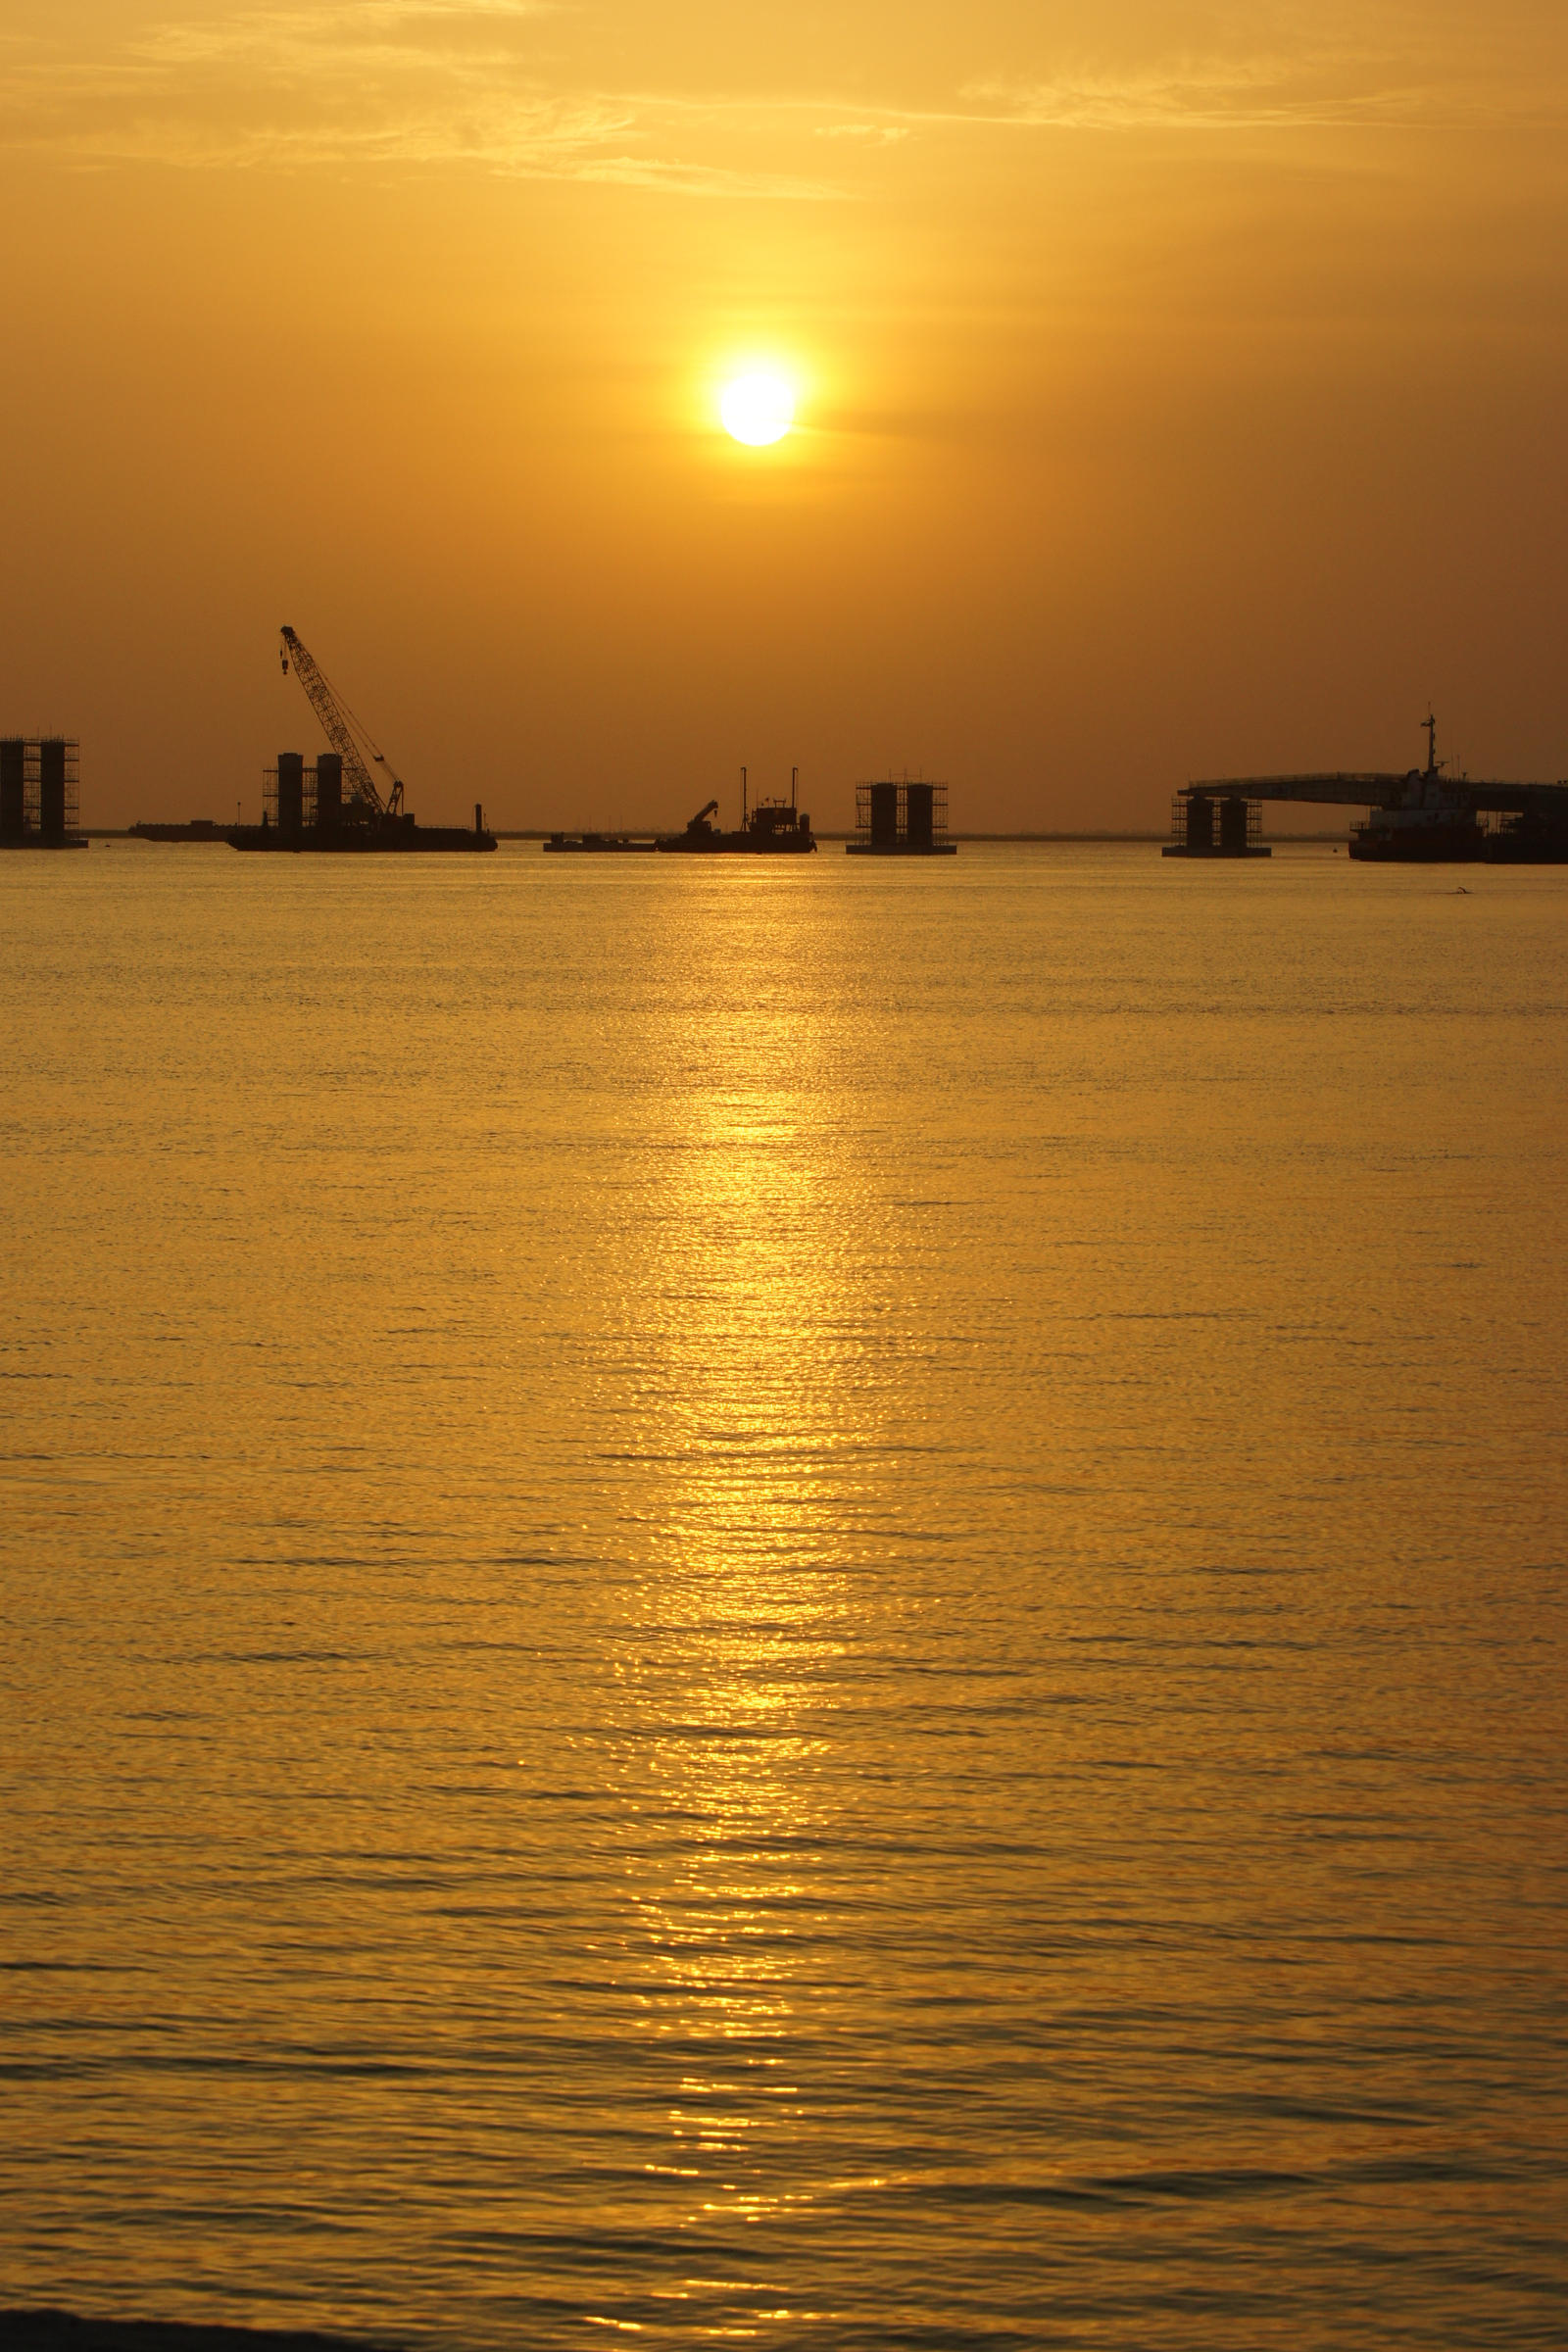 Abu Dhabi Sunset 2 by